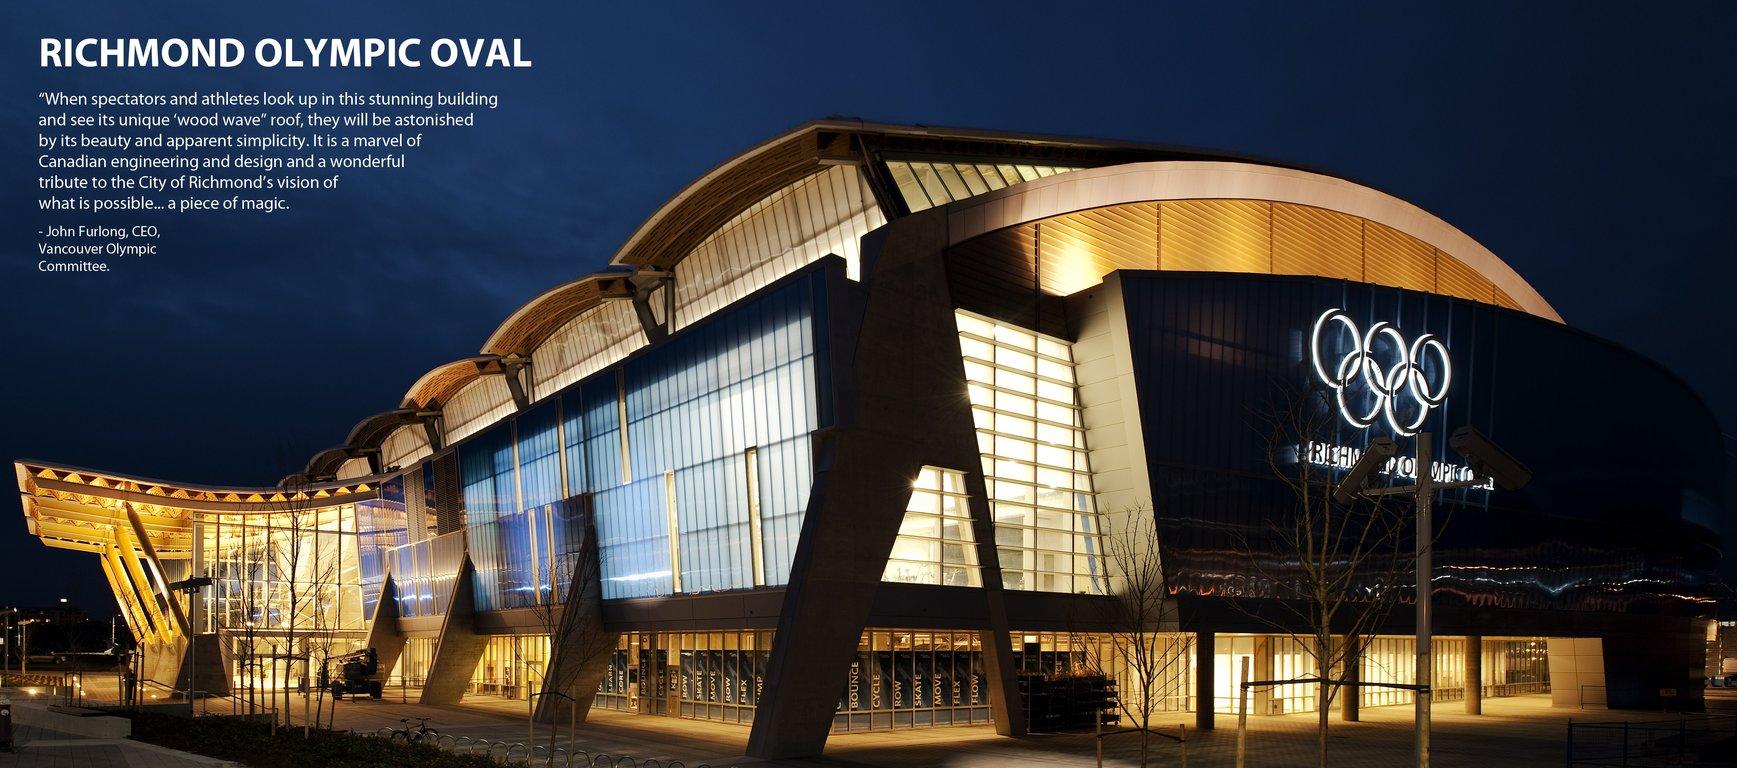 1_Richmond_Olympic_Oval_Credit_Hubert_Kang.jpg